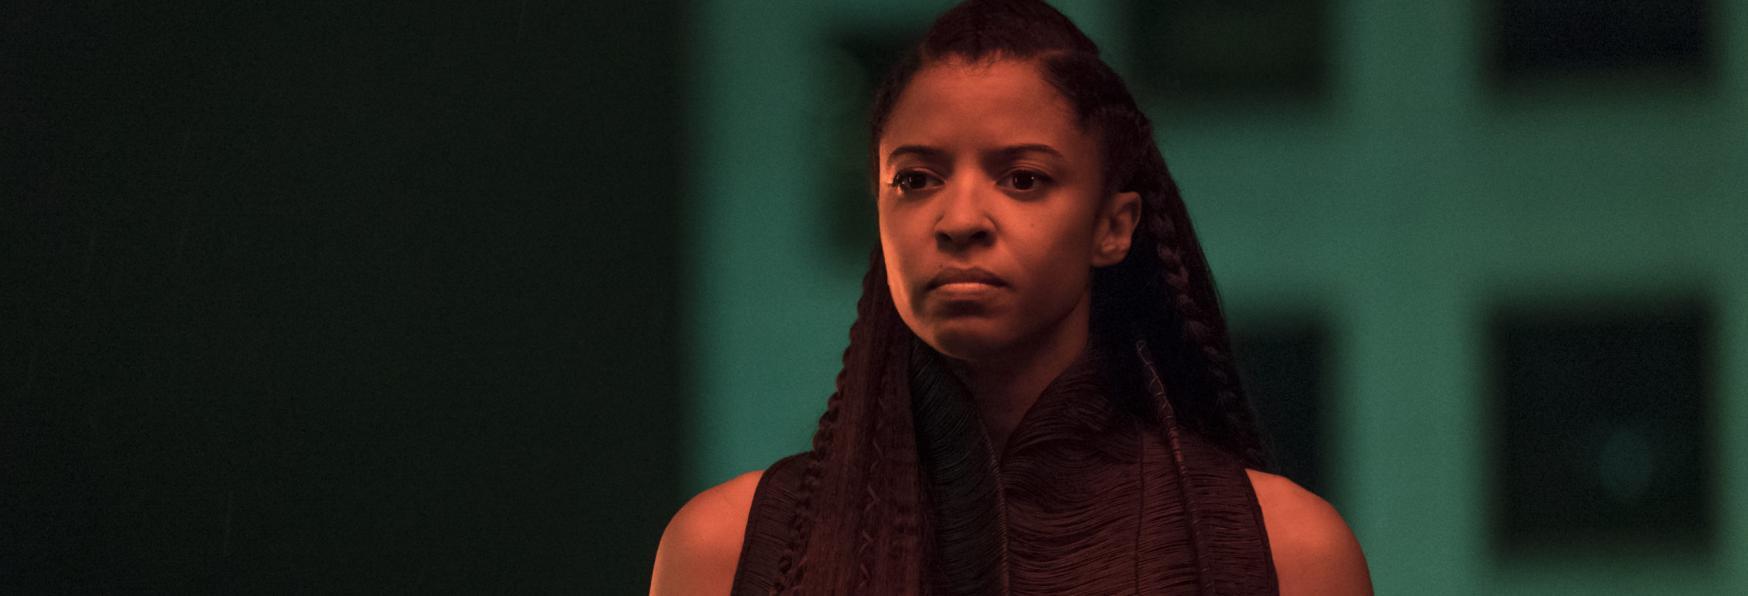 She-Hulk: Renée Elise Goldsberry farà parte della Serie TV di Disney